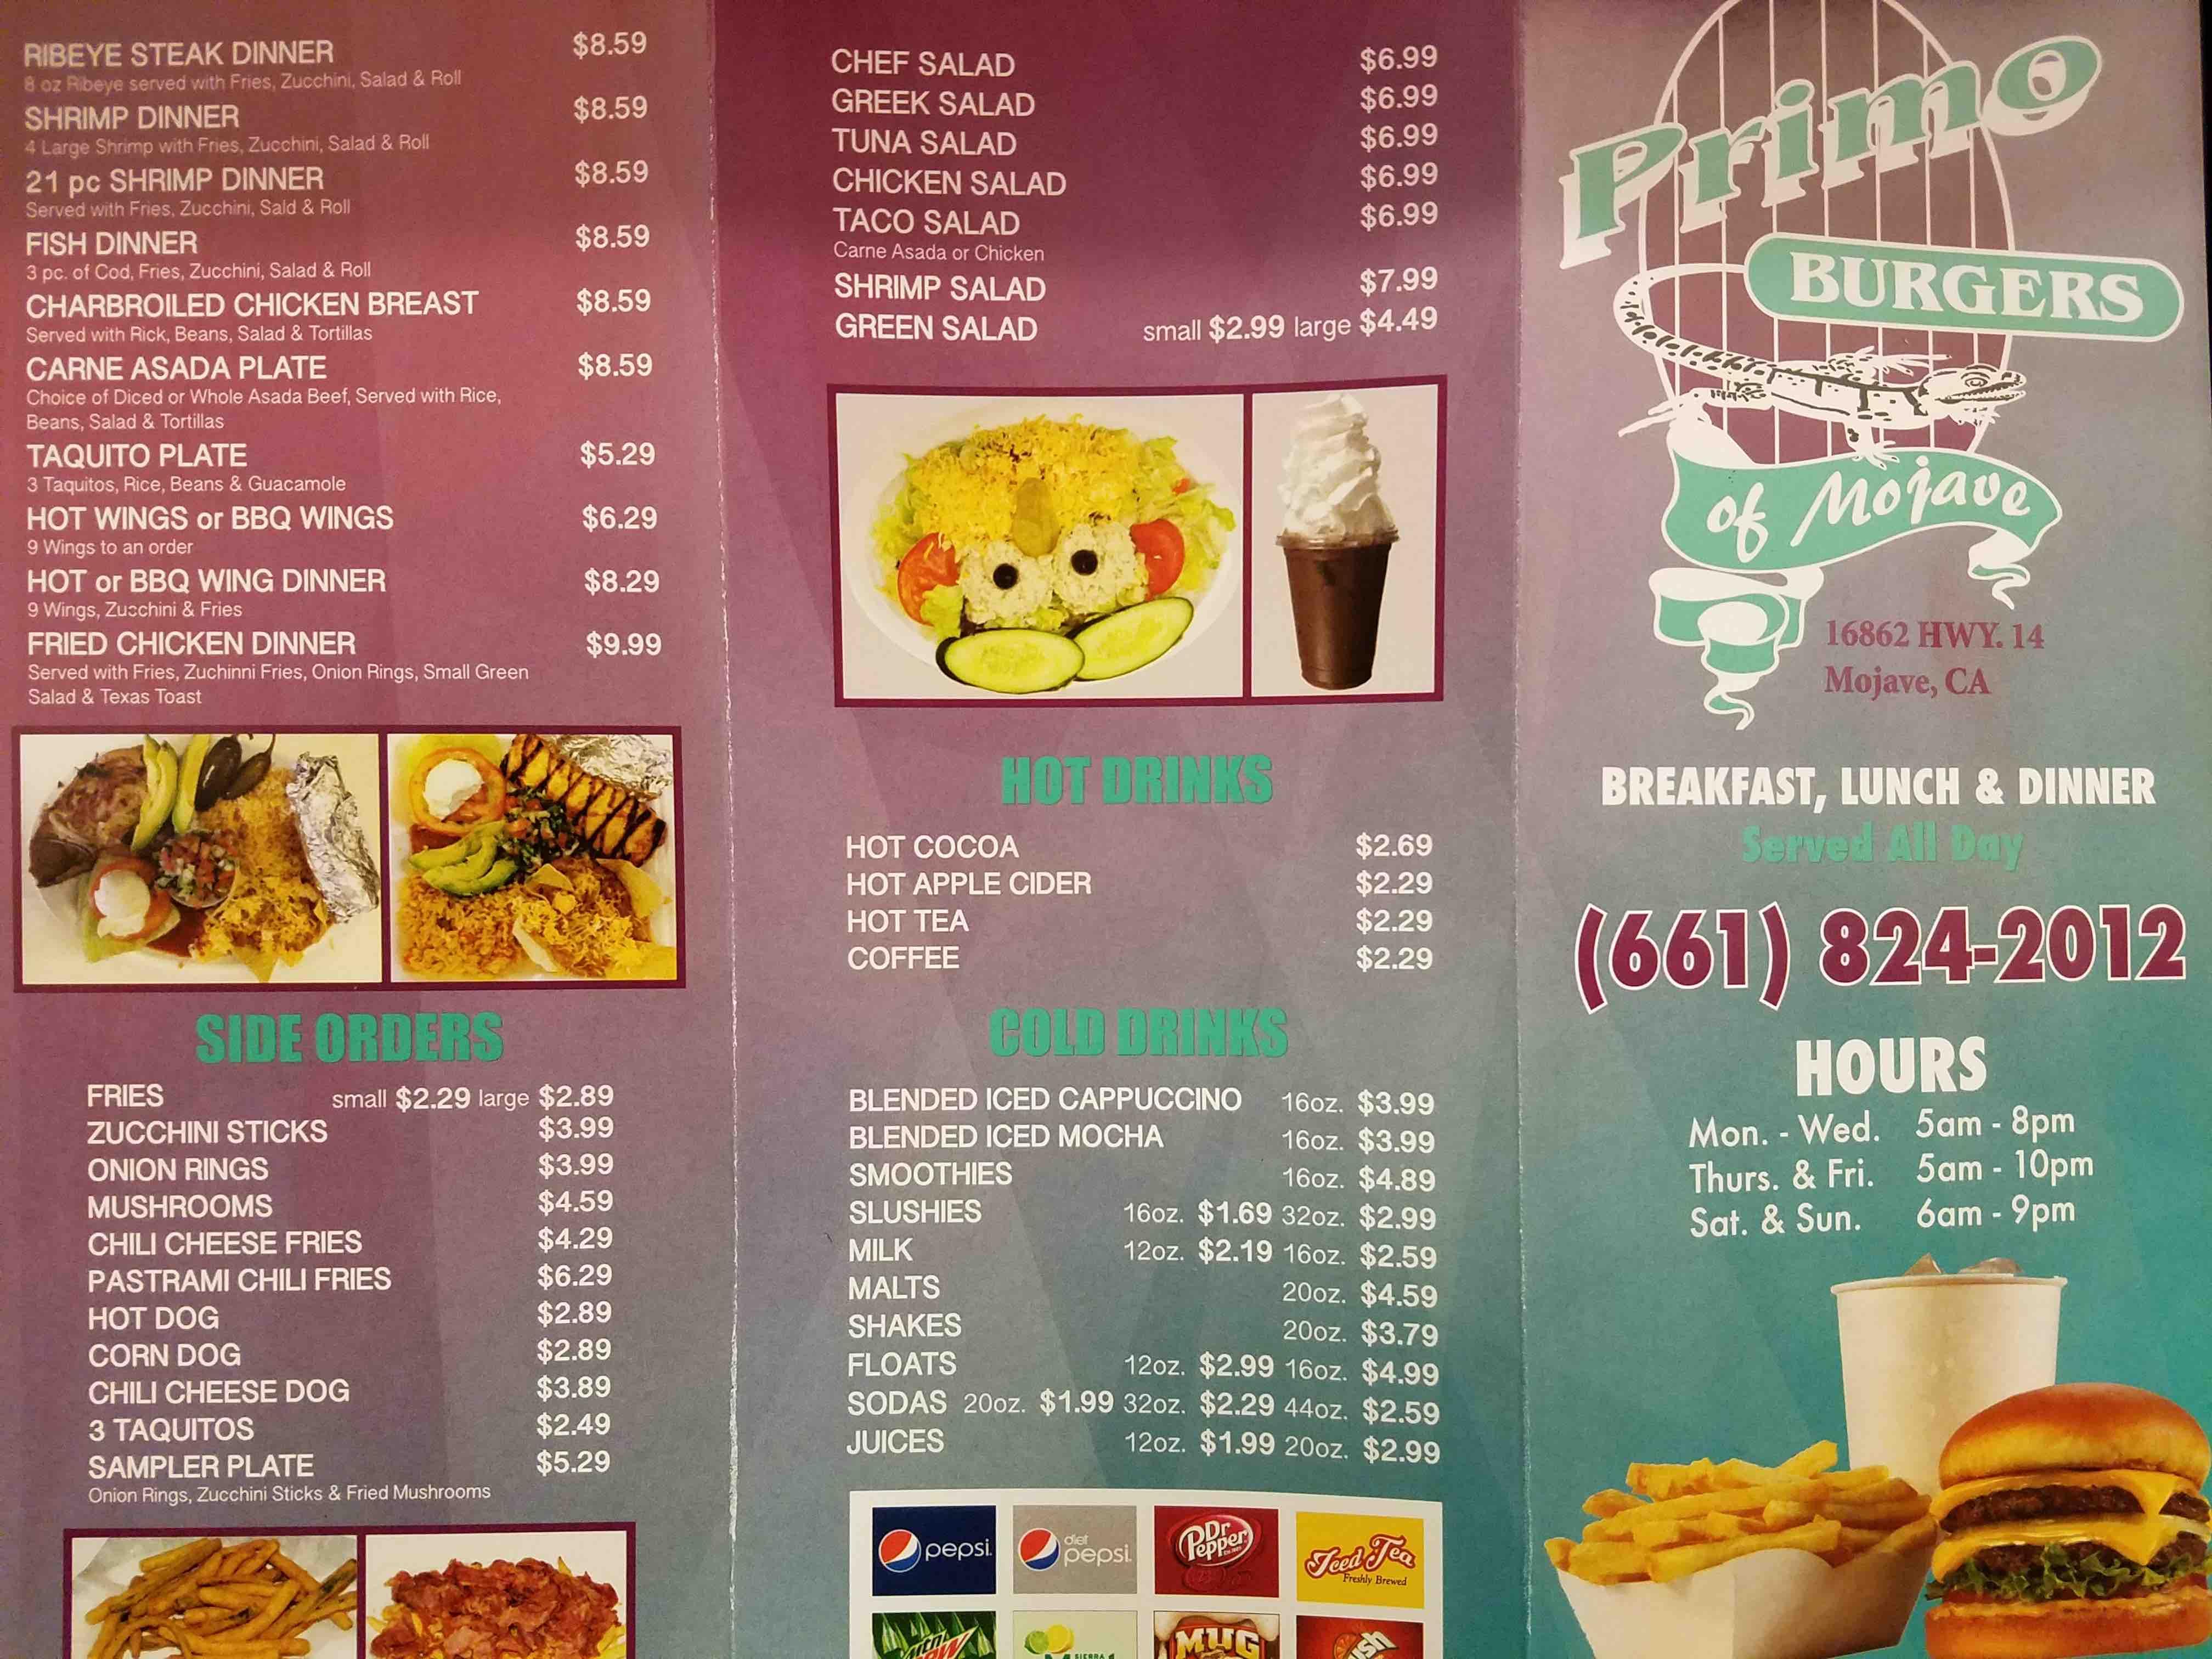 Online Menu Of Primo Burgers Restaurant Mojave California 93501